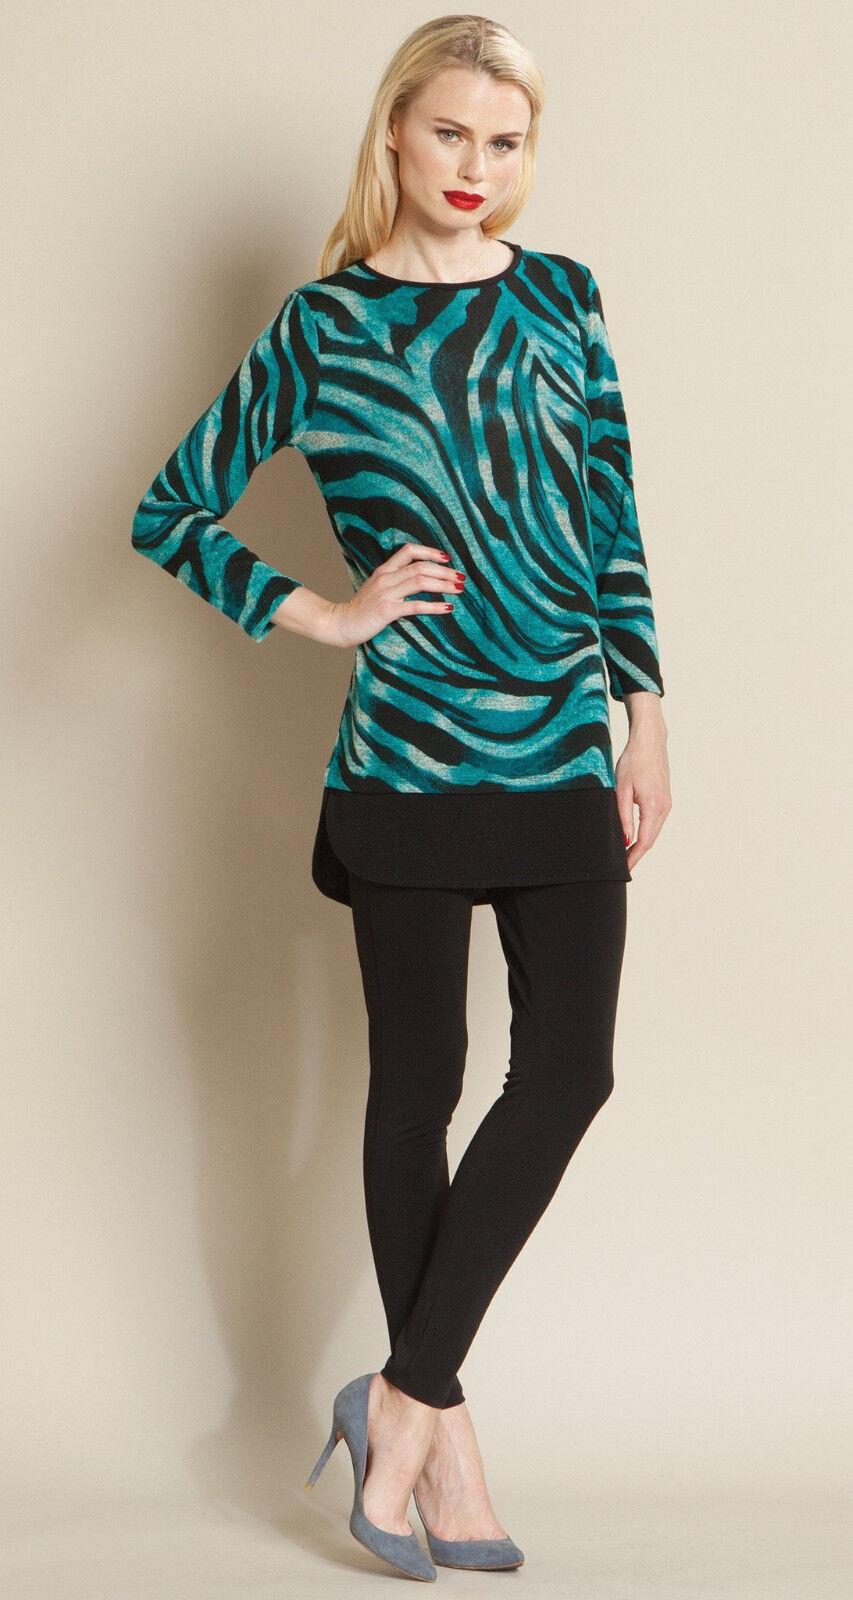 Clara Sun Woo Turquoise Zebra Swirl Print & Noir Ourlet Pull Tunique SZ. M 98